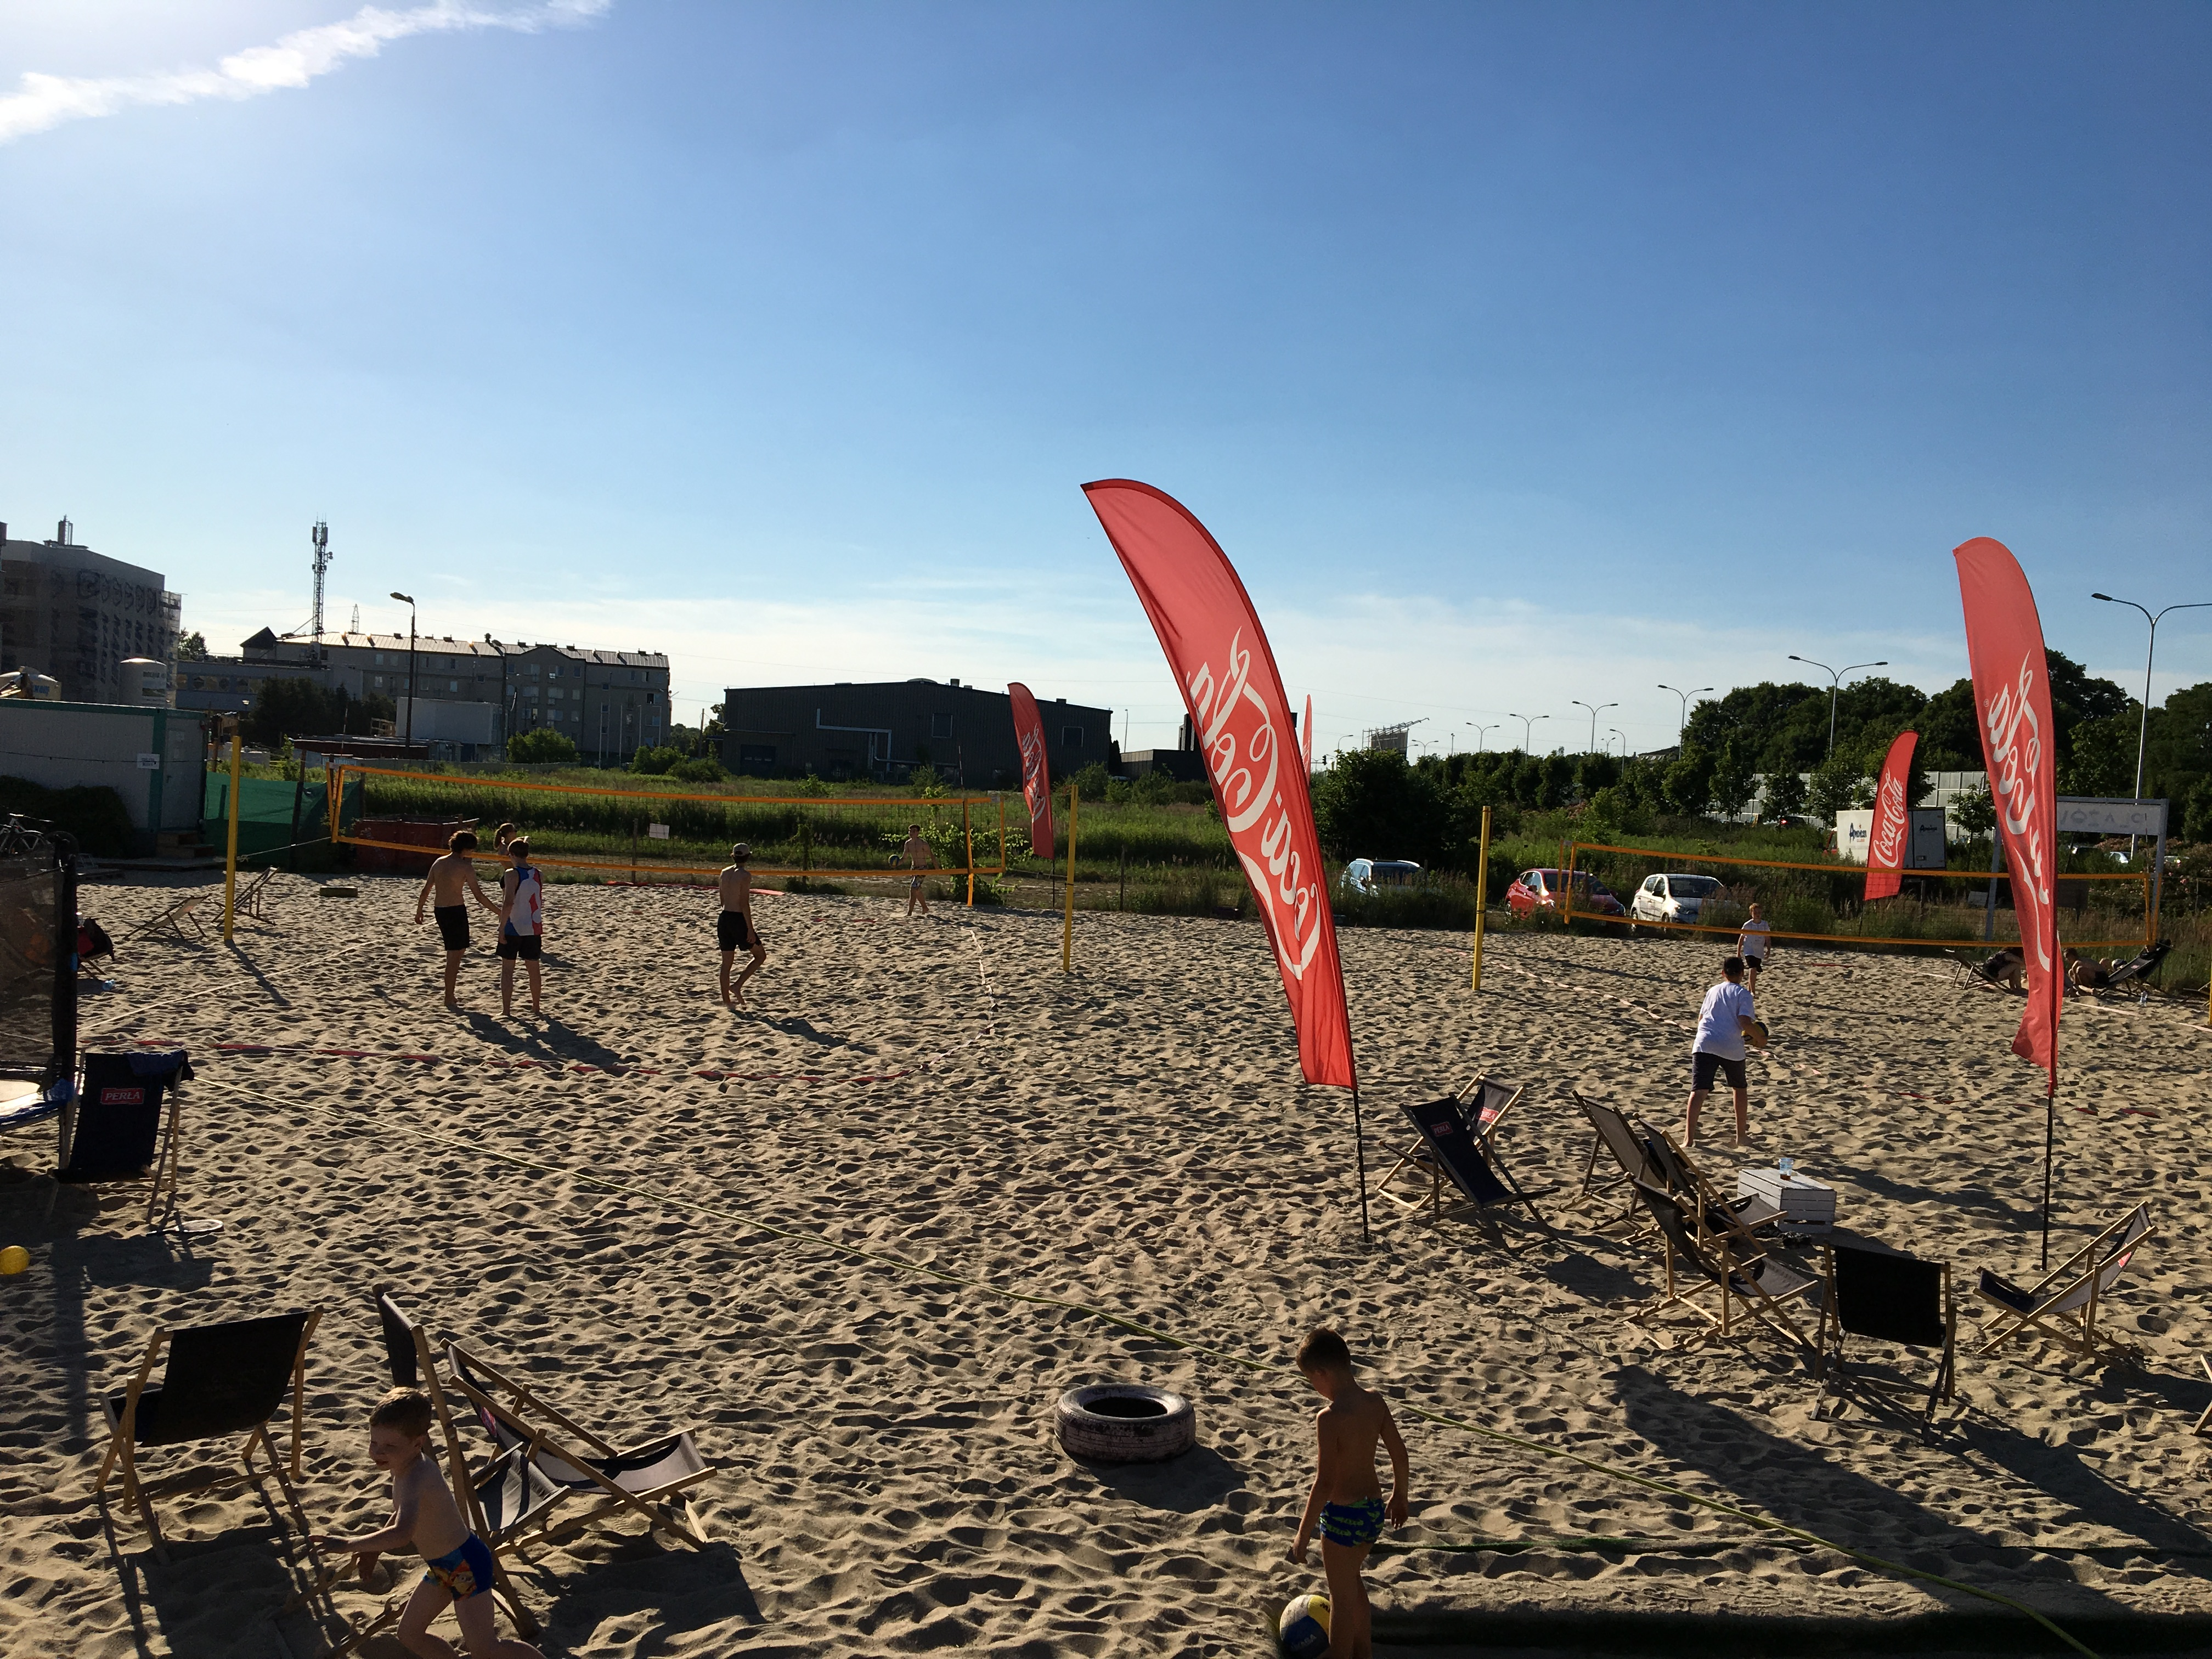 plaża Ursus w Warszawie